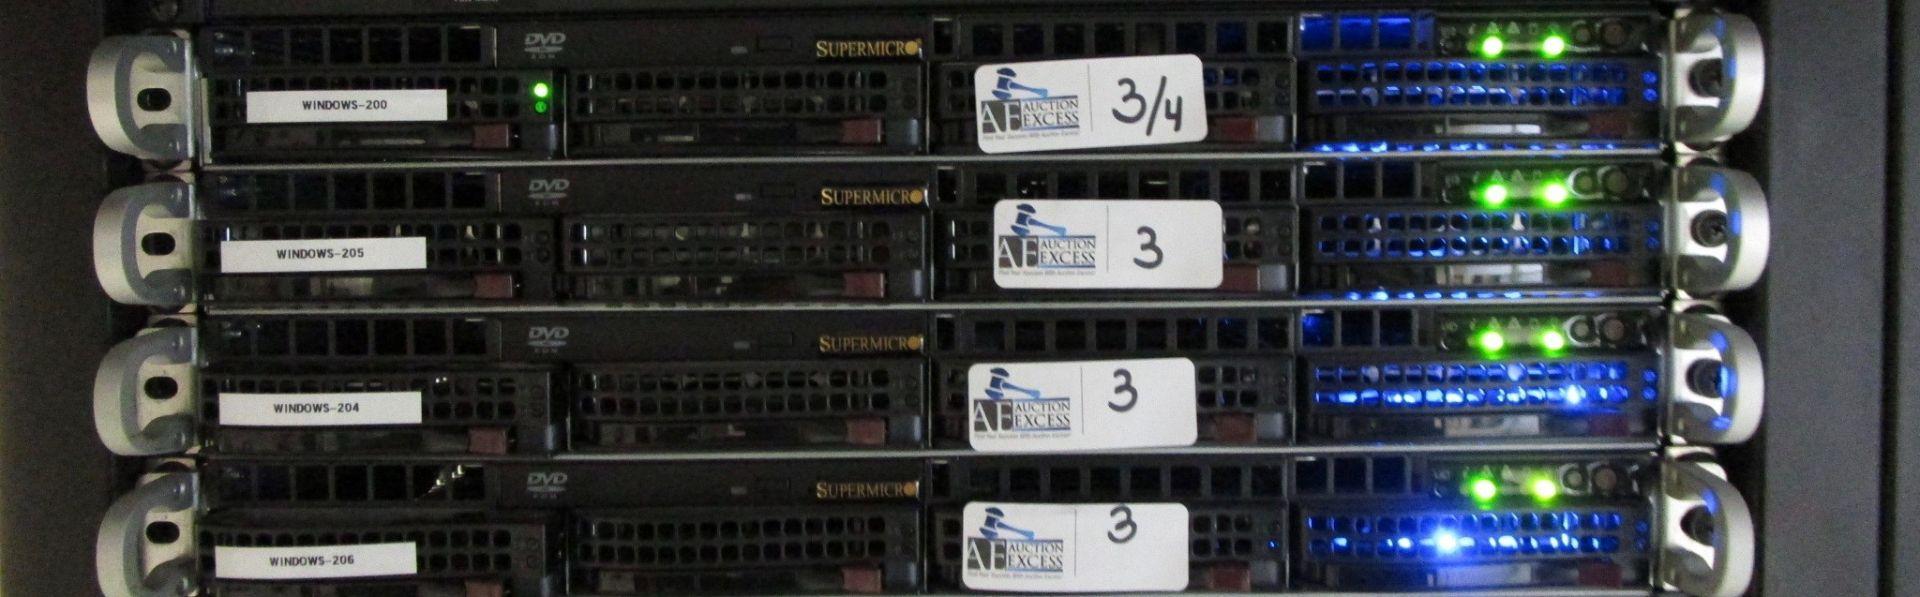 Lot 3 - LOT OF 4 AMD DUAL CPU RENDER NODES